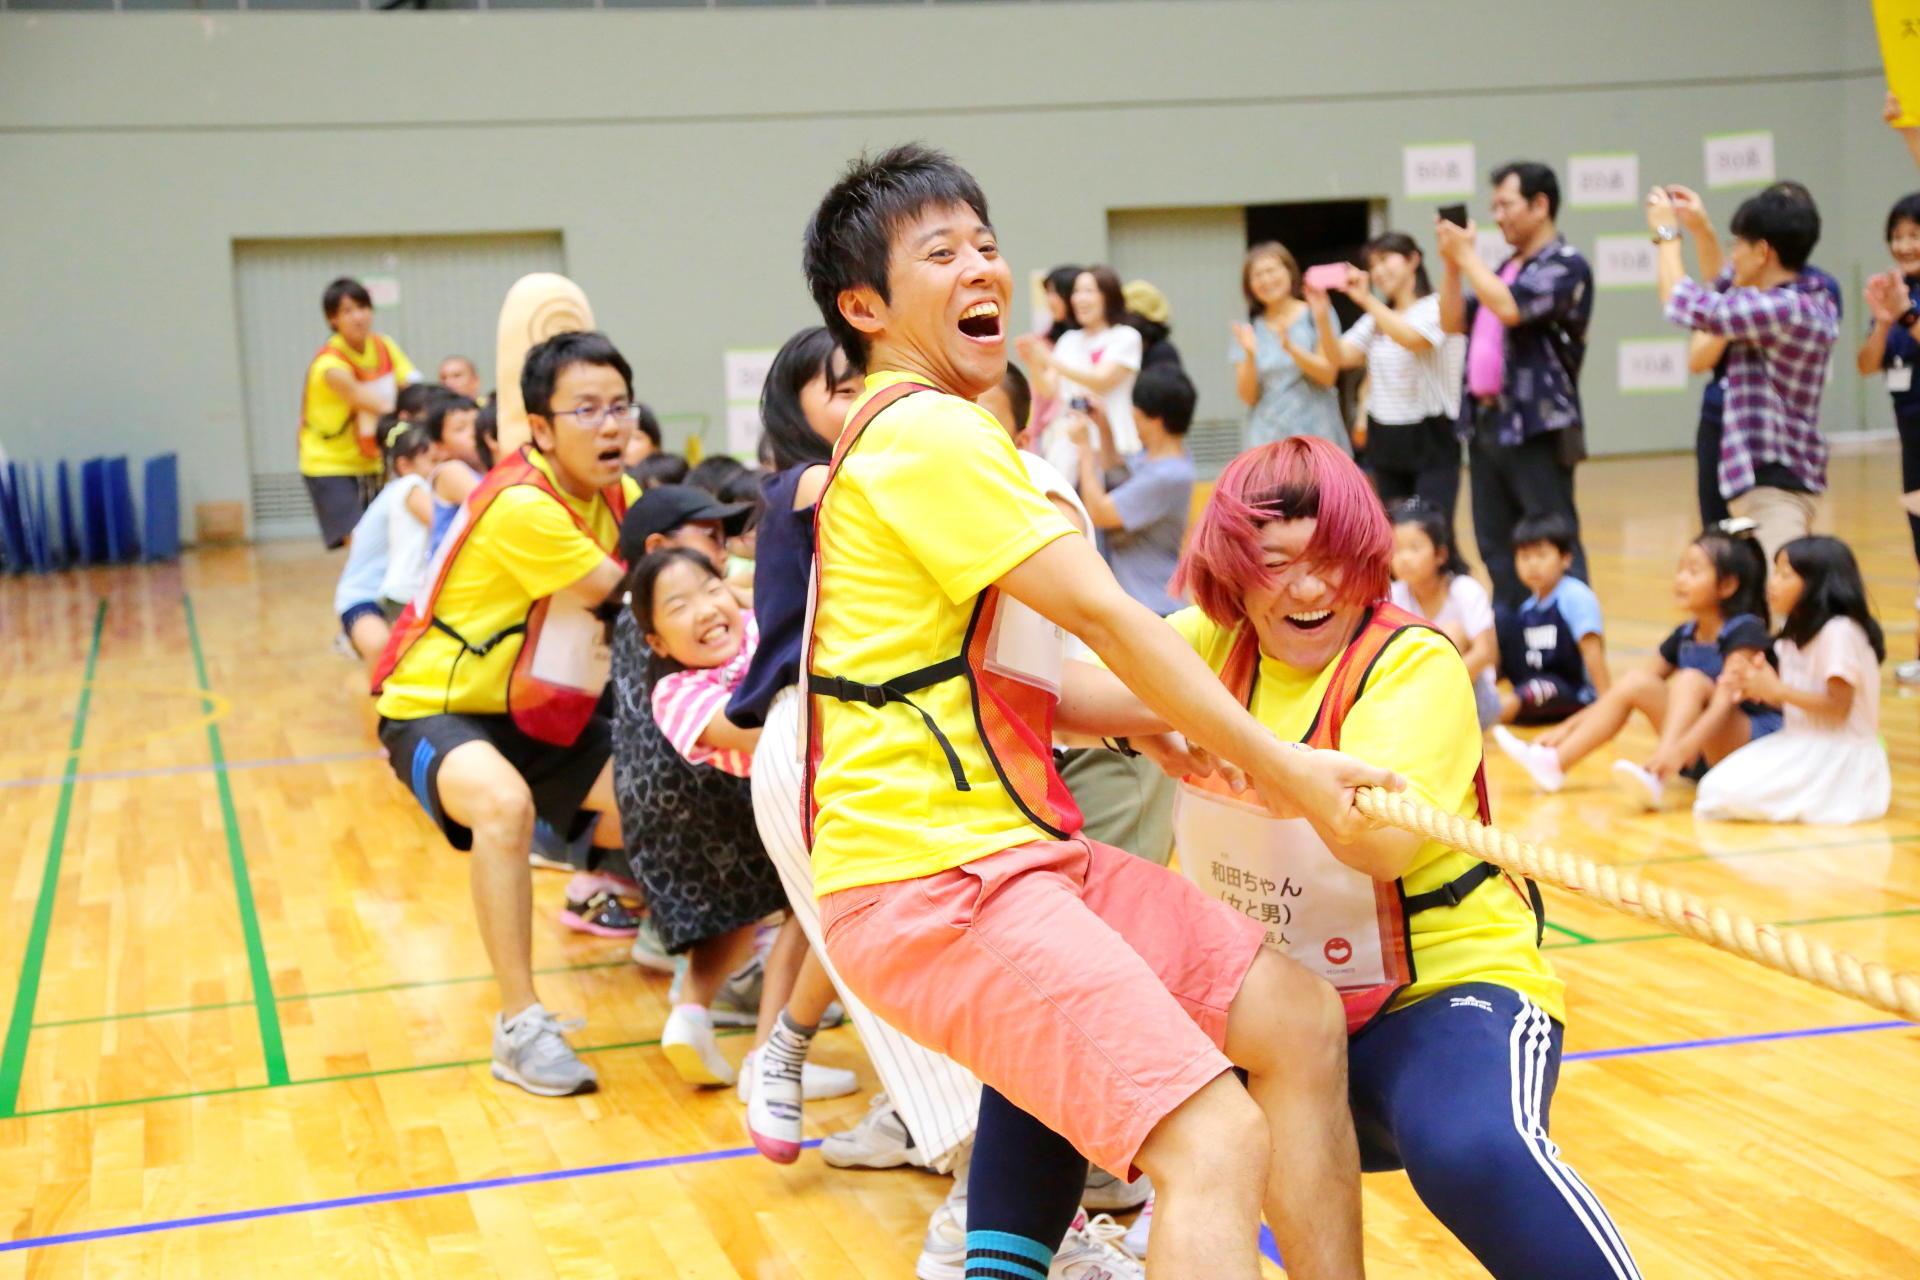 http://news.yoshimoto.co.jp/20171012102631-29ffc7f190ea93504a0260891a51fee36f255cc7.jpg